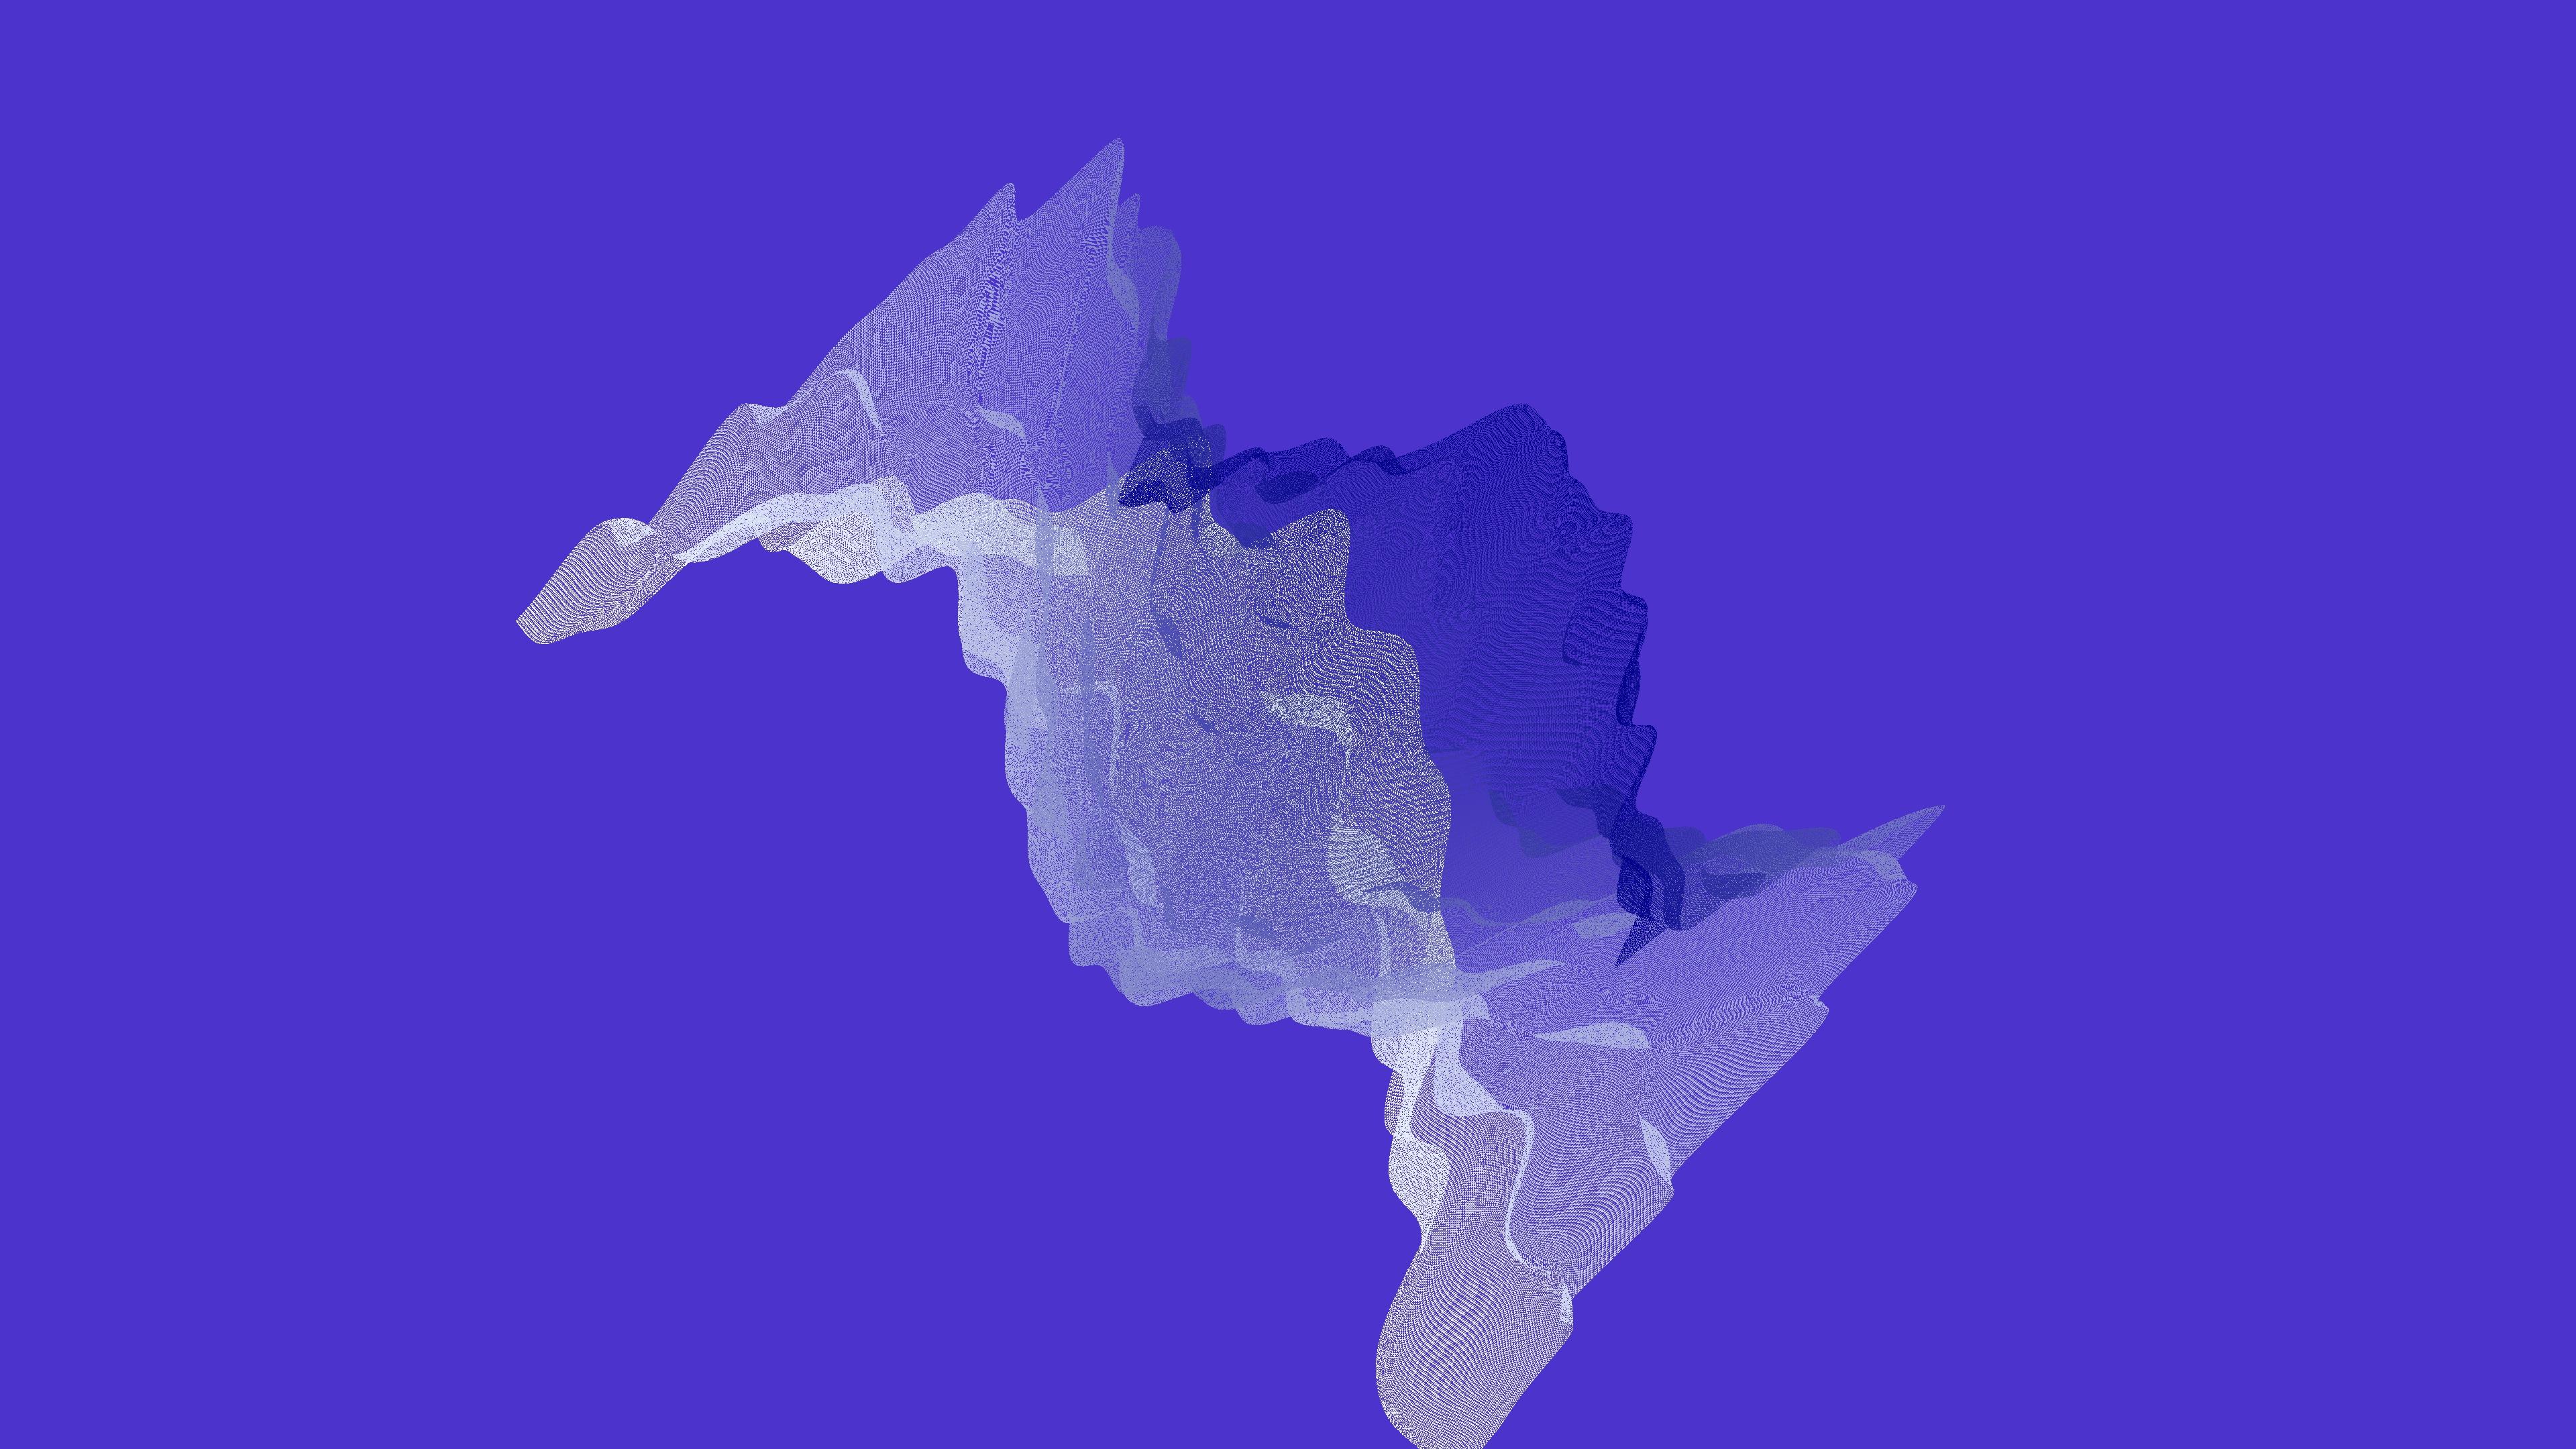 distorted_mesh01